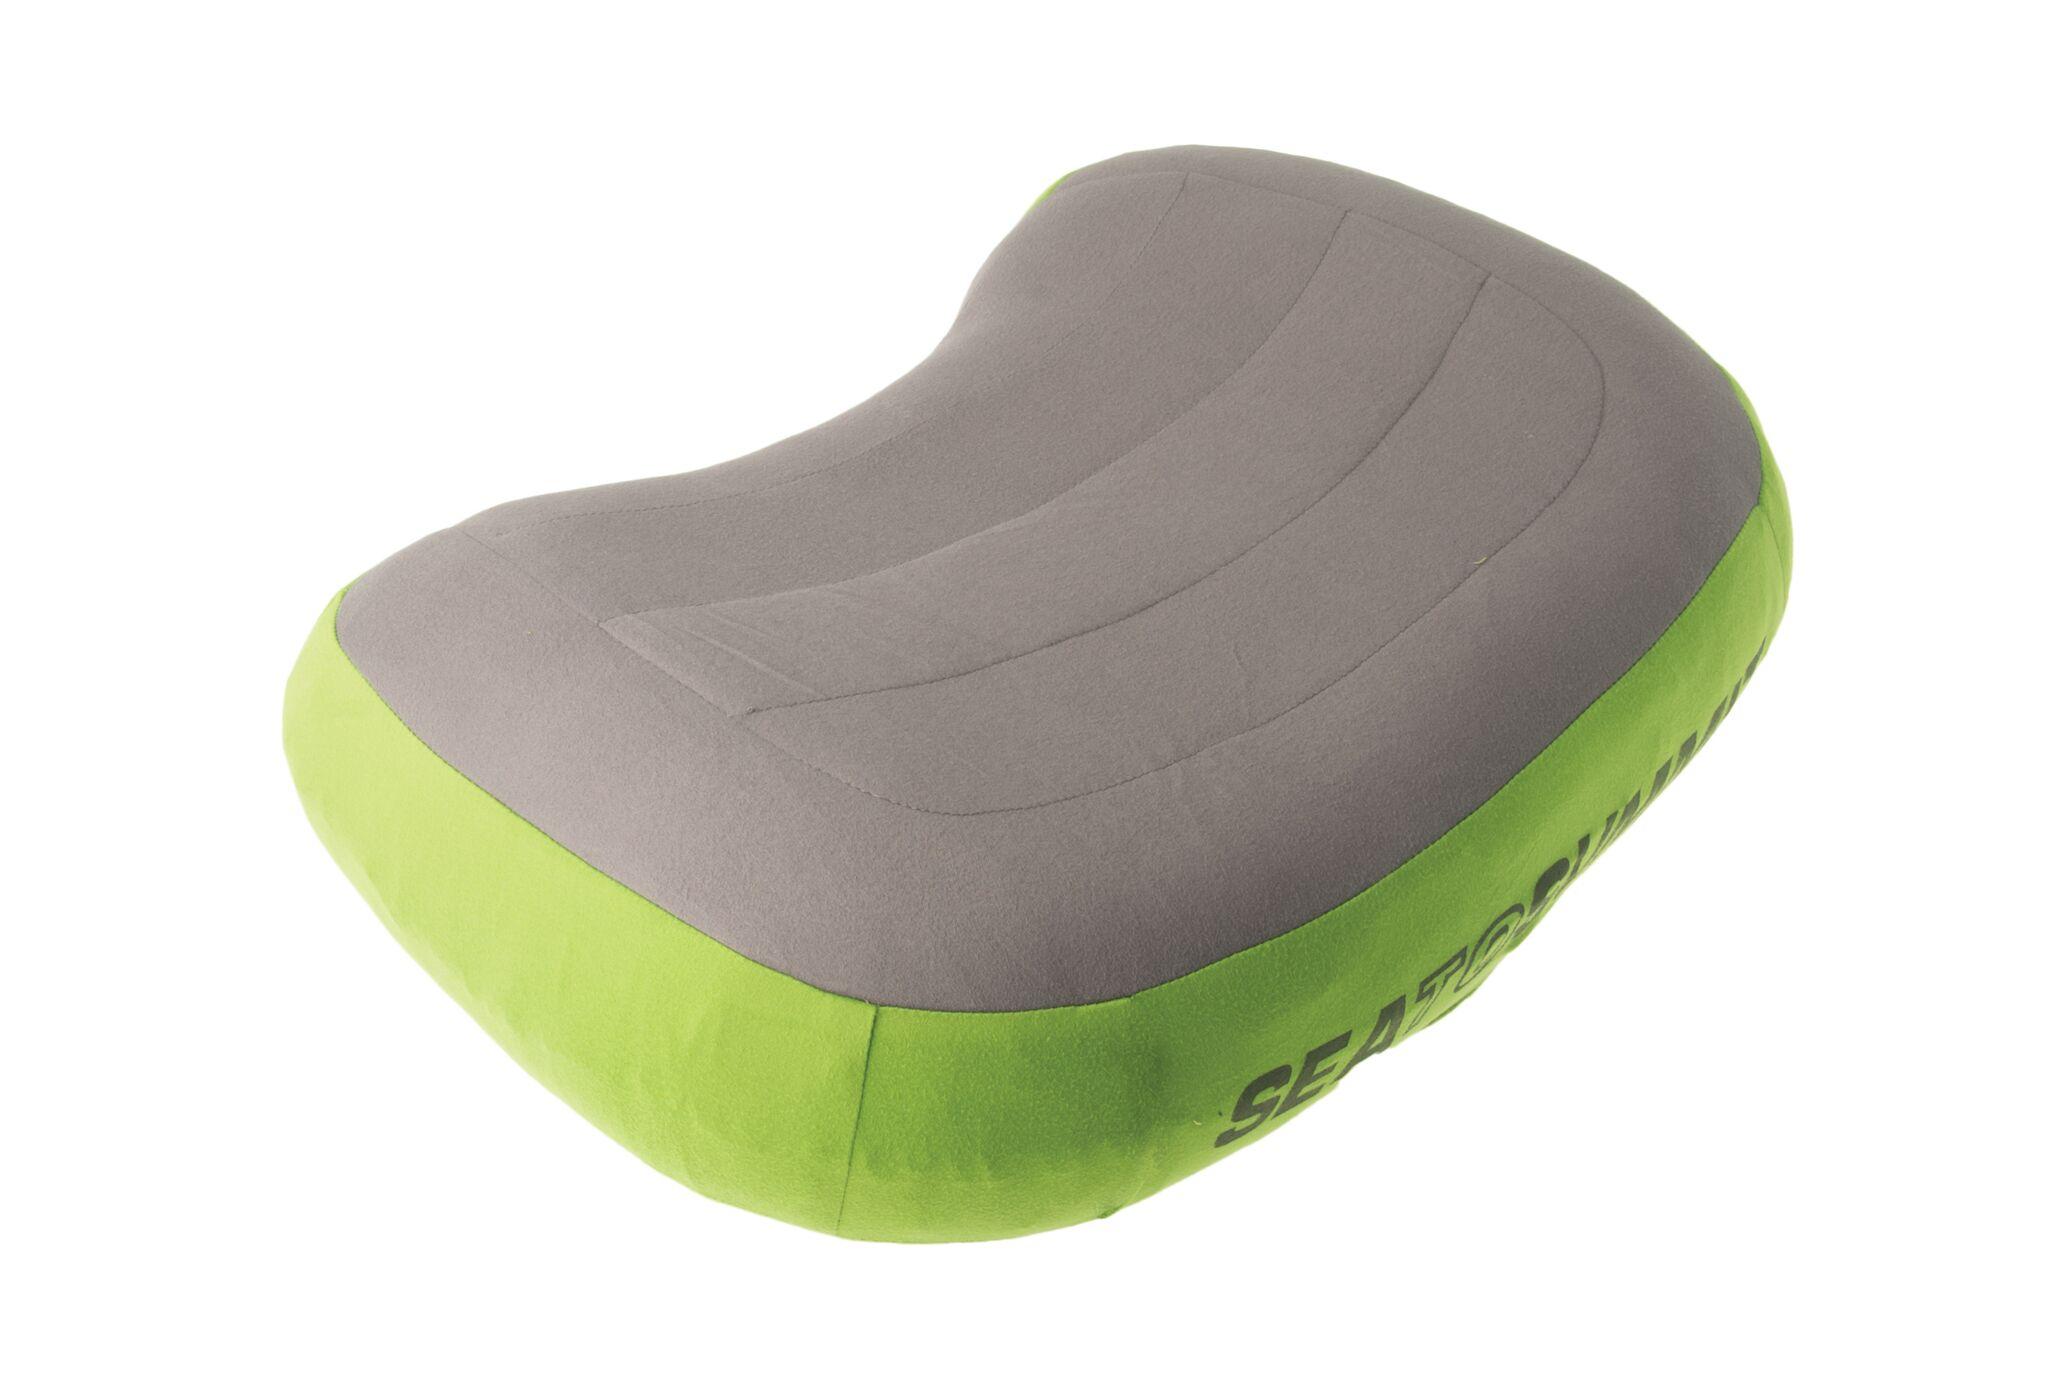 Billede af Seatosummit Aeros Premium Pillow Regular Grøn